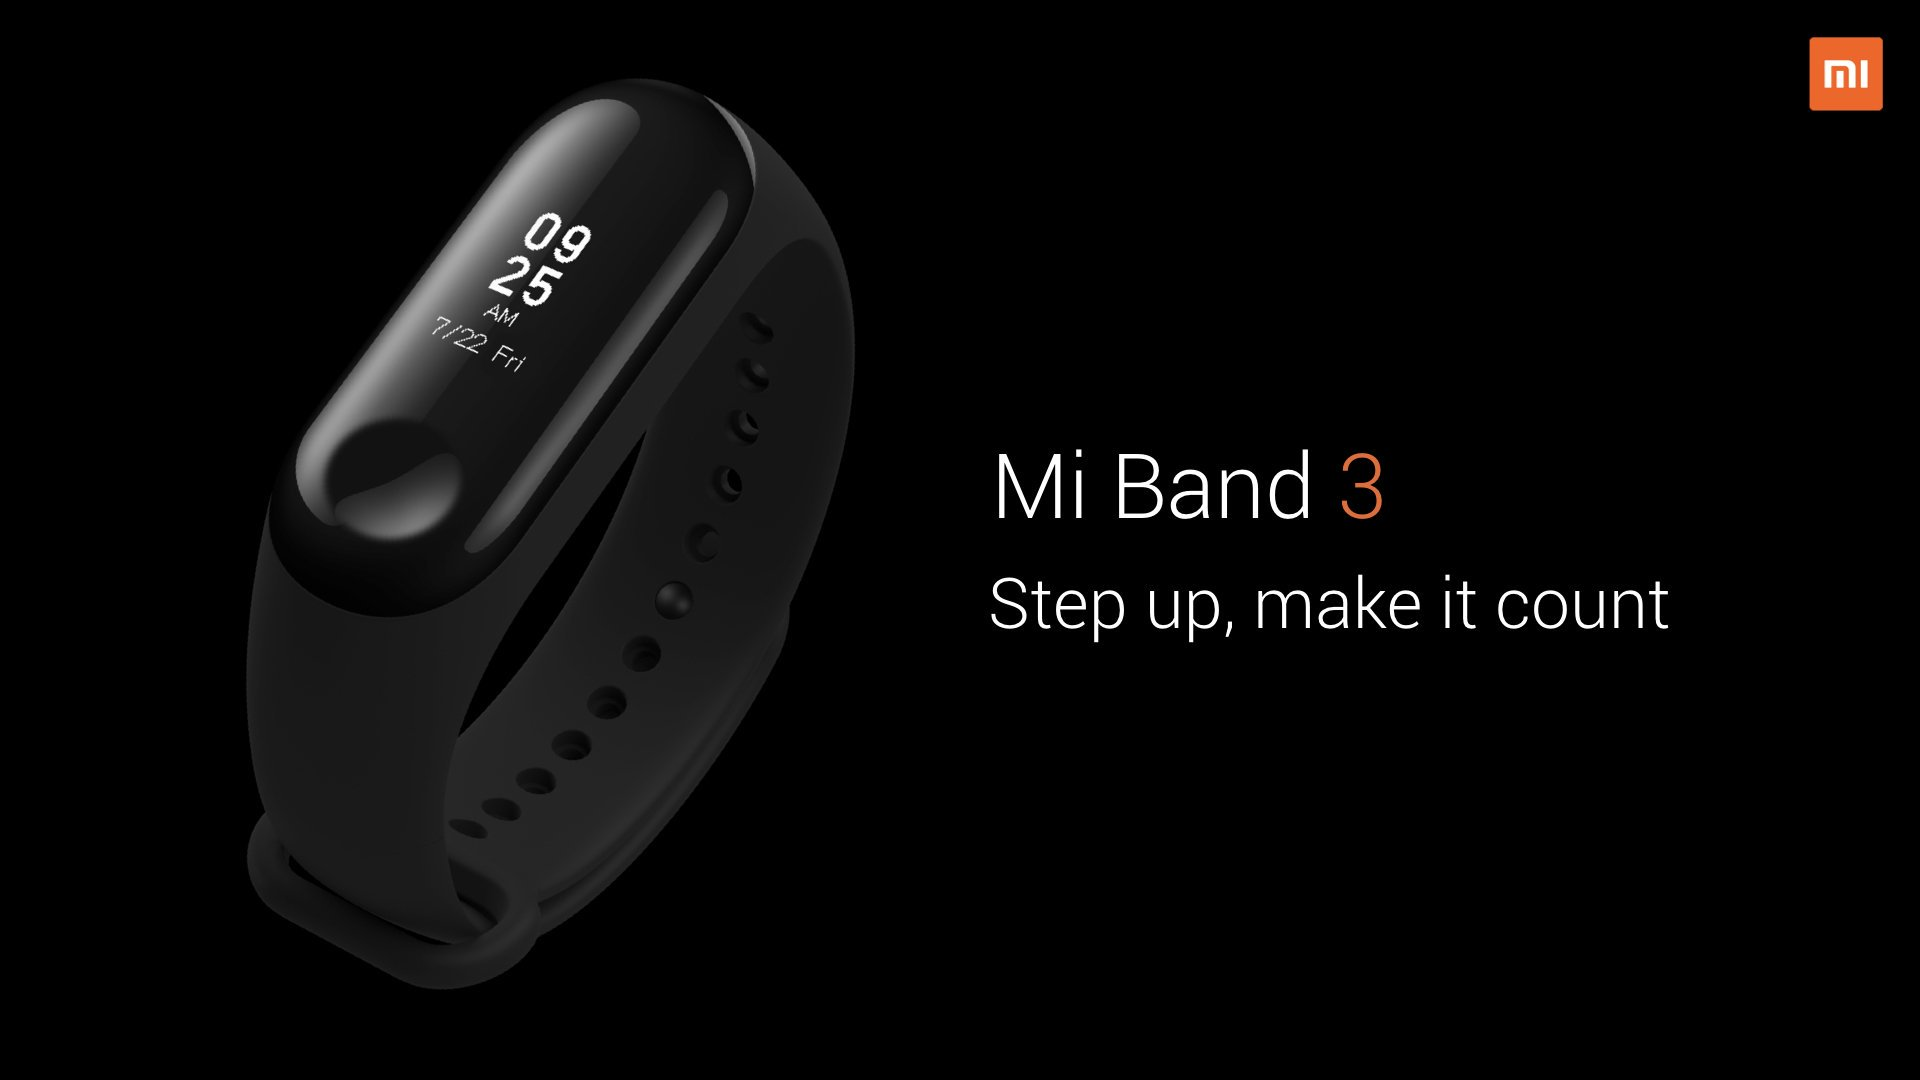 Mi Band 3 : أفضل سوار رياضي حتي الآن ؟ 1